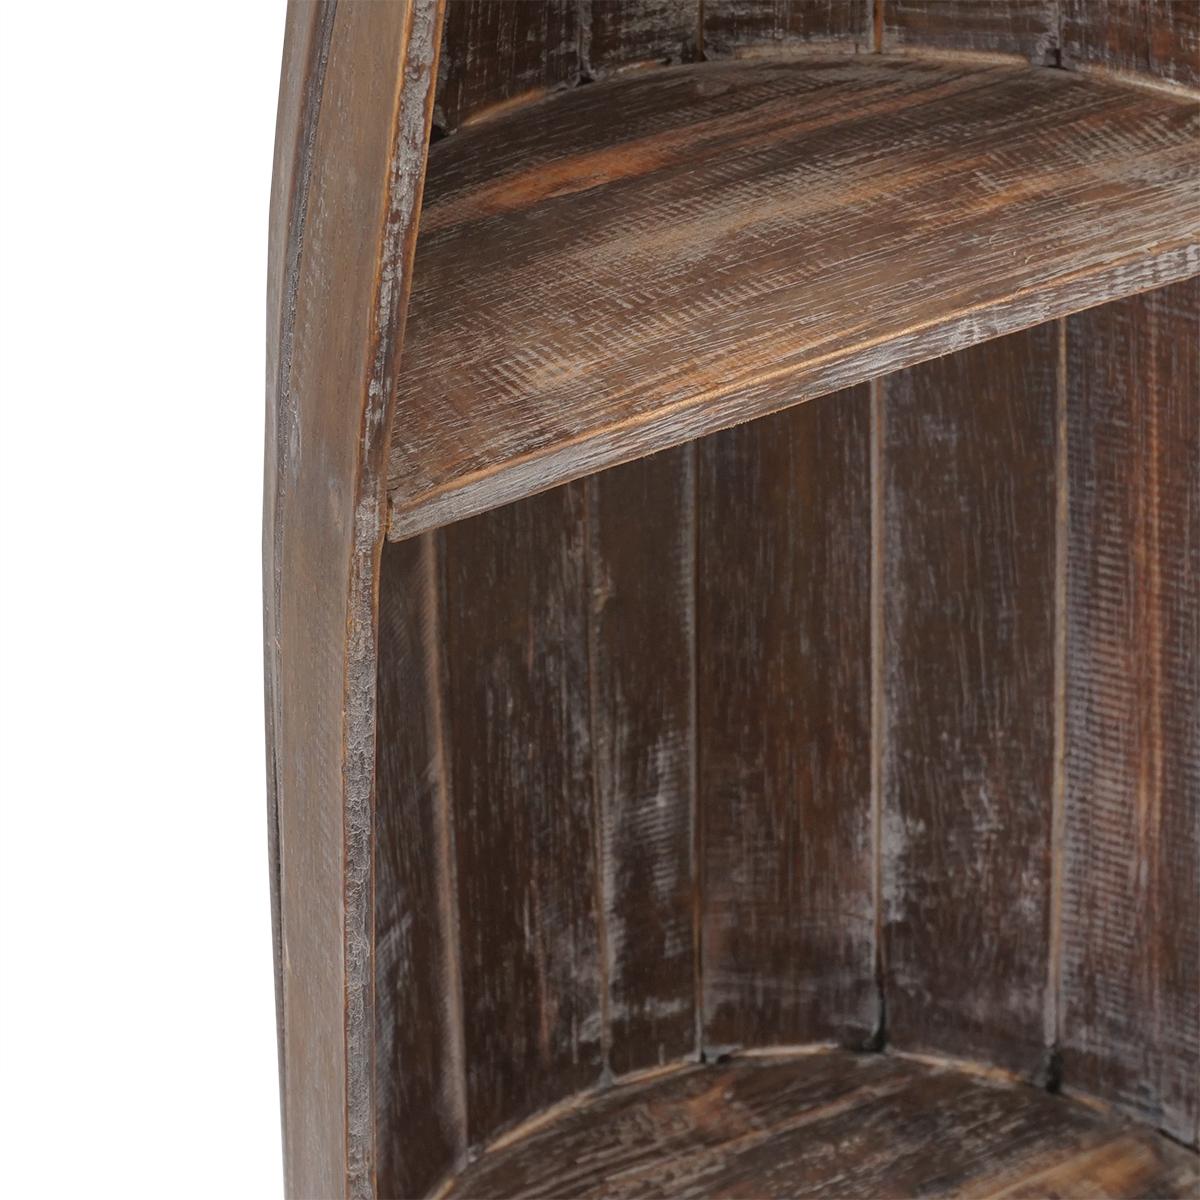 Bootsregal Holzregal Standregal maritim Bücherregal Badezimmerregal braun Albesia Holz – Bild 4